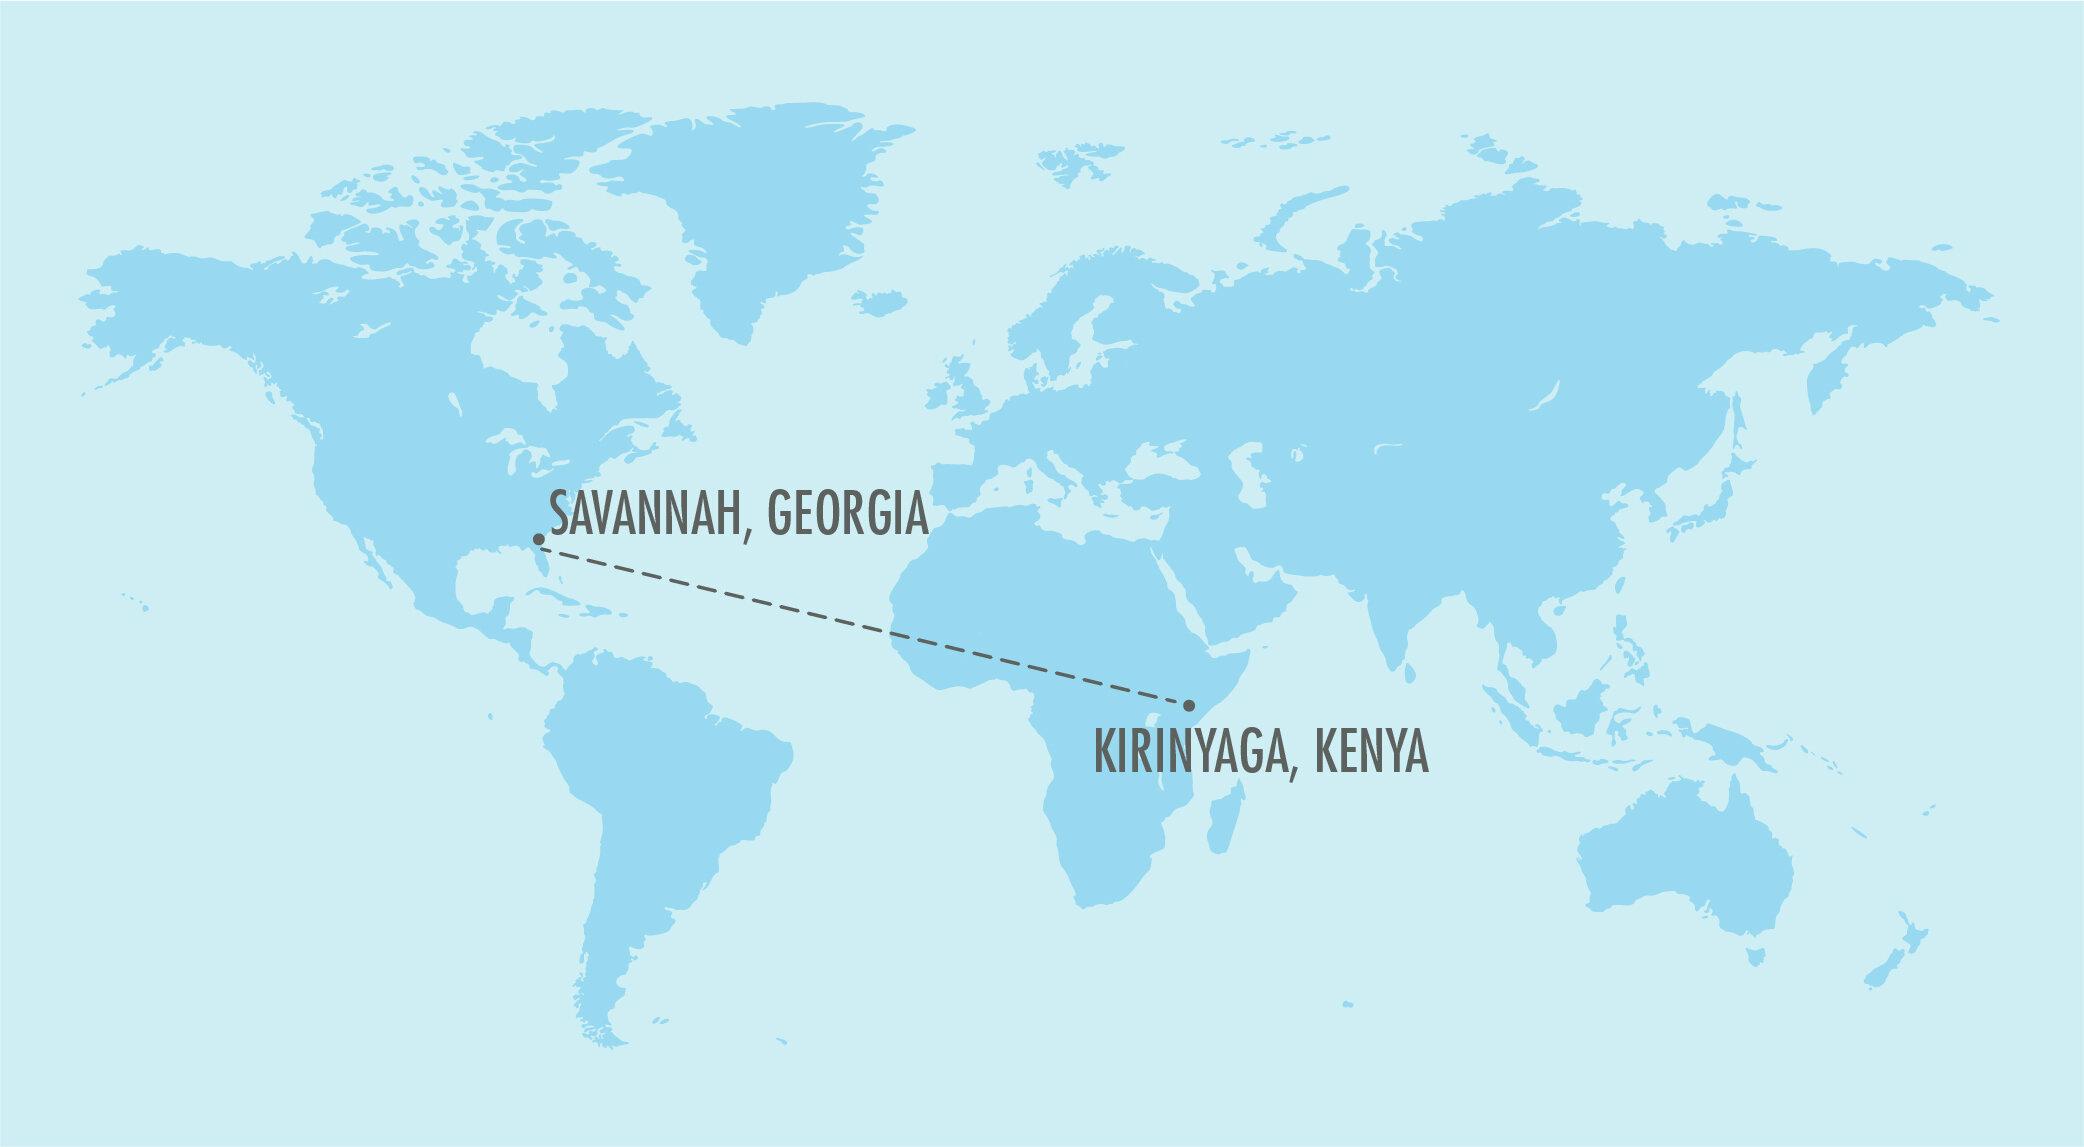 map_kenya_kiunyu.jpg